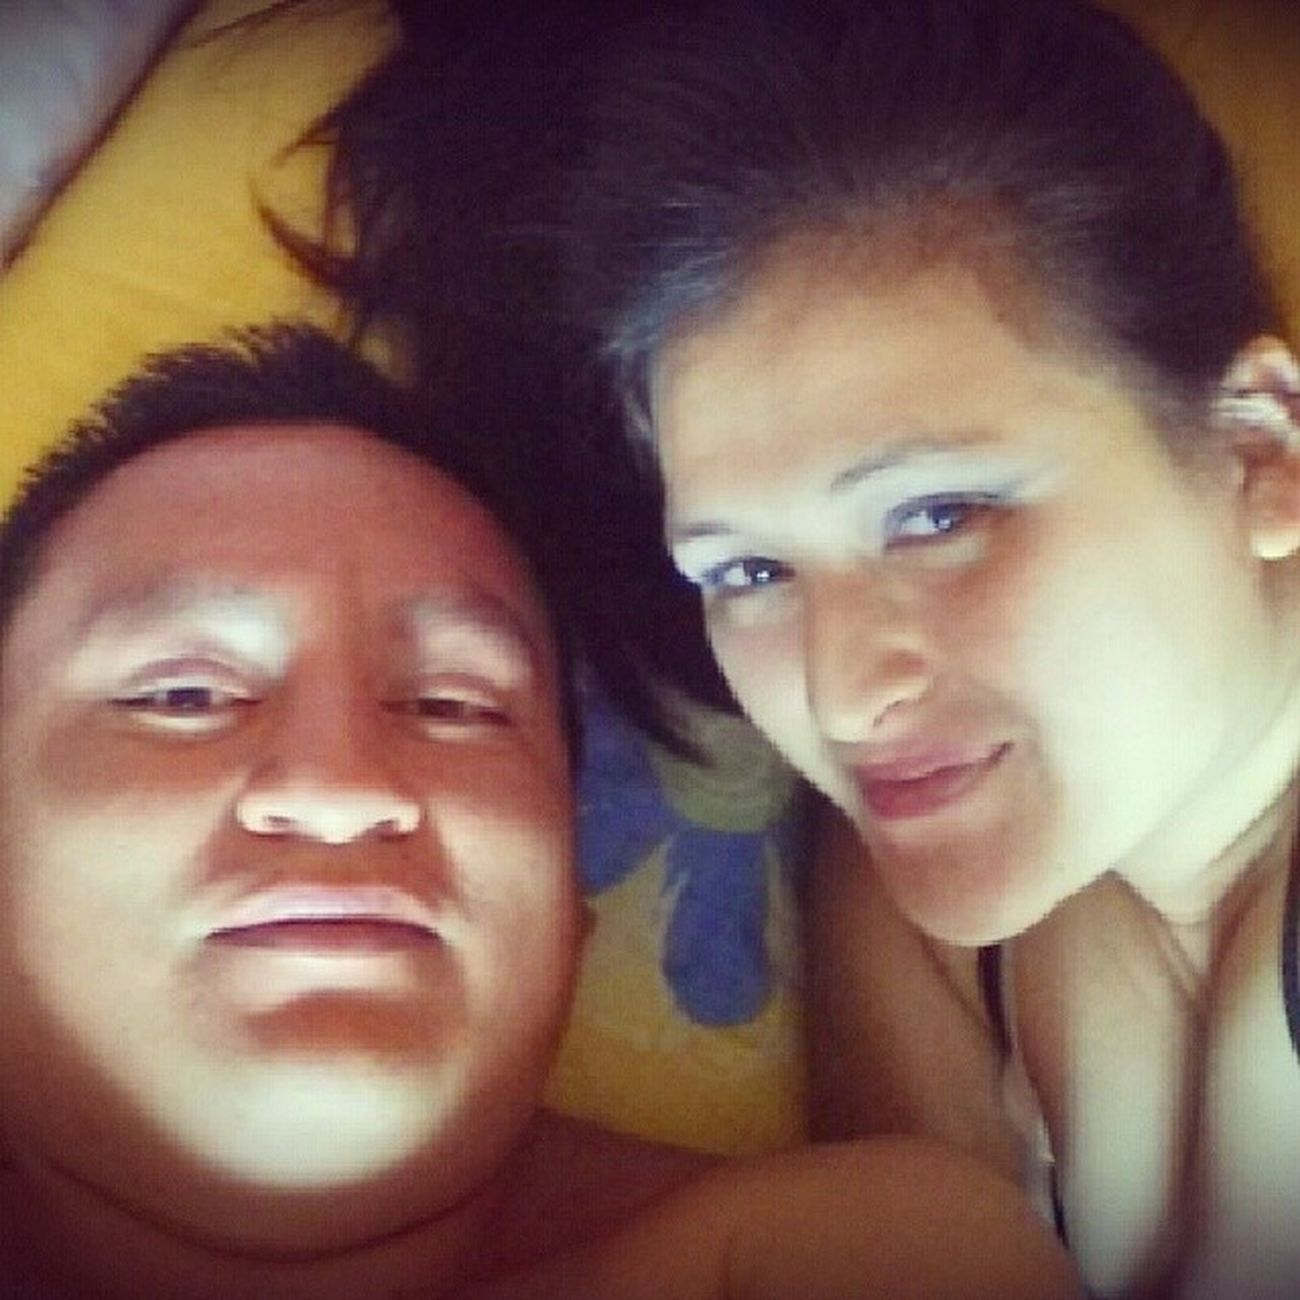 Domingo de relax con mi amore